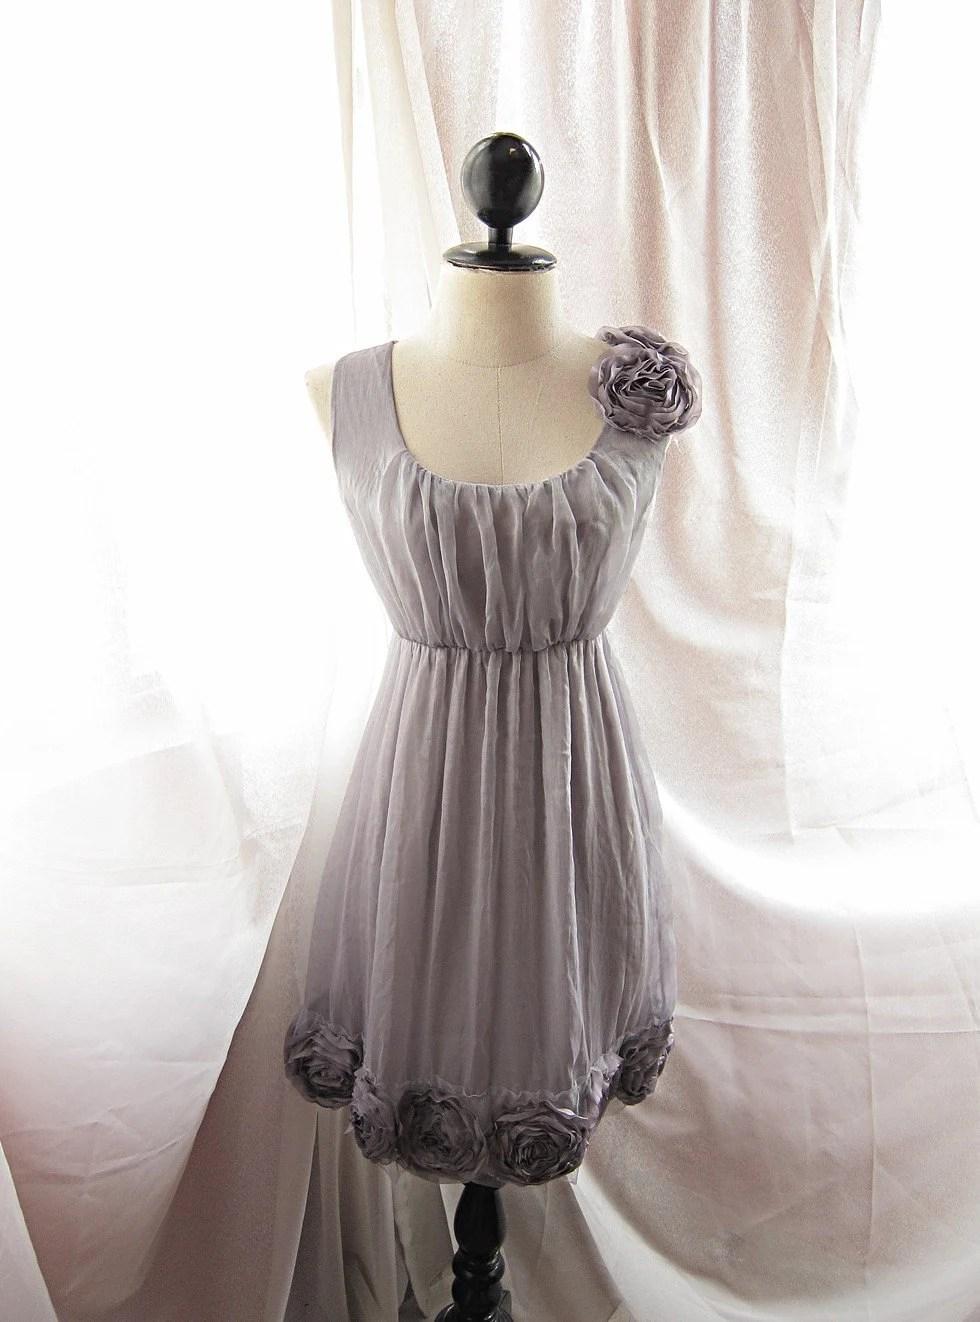 Dreamy Misty Earl Gray Rainy Nostalgia Dusty Rosette Soft Heavenly Chiffon Romantic Marie Antoinette Dress